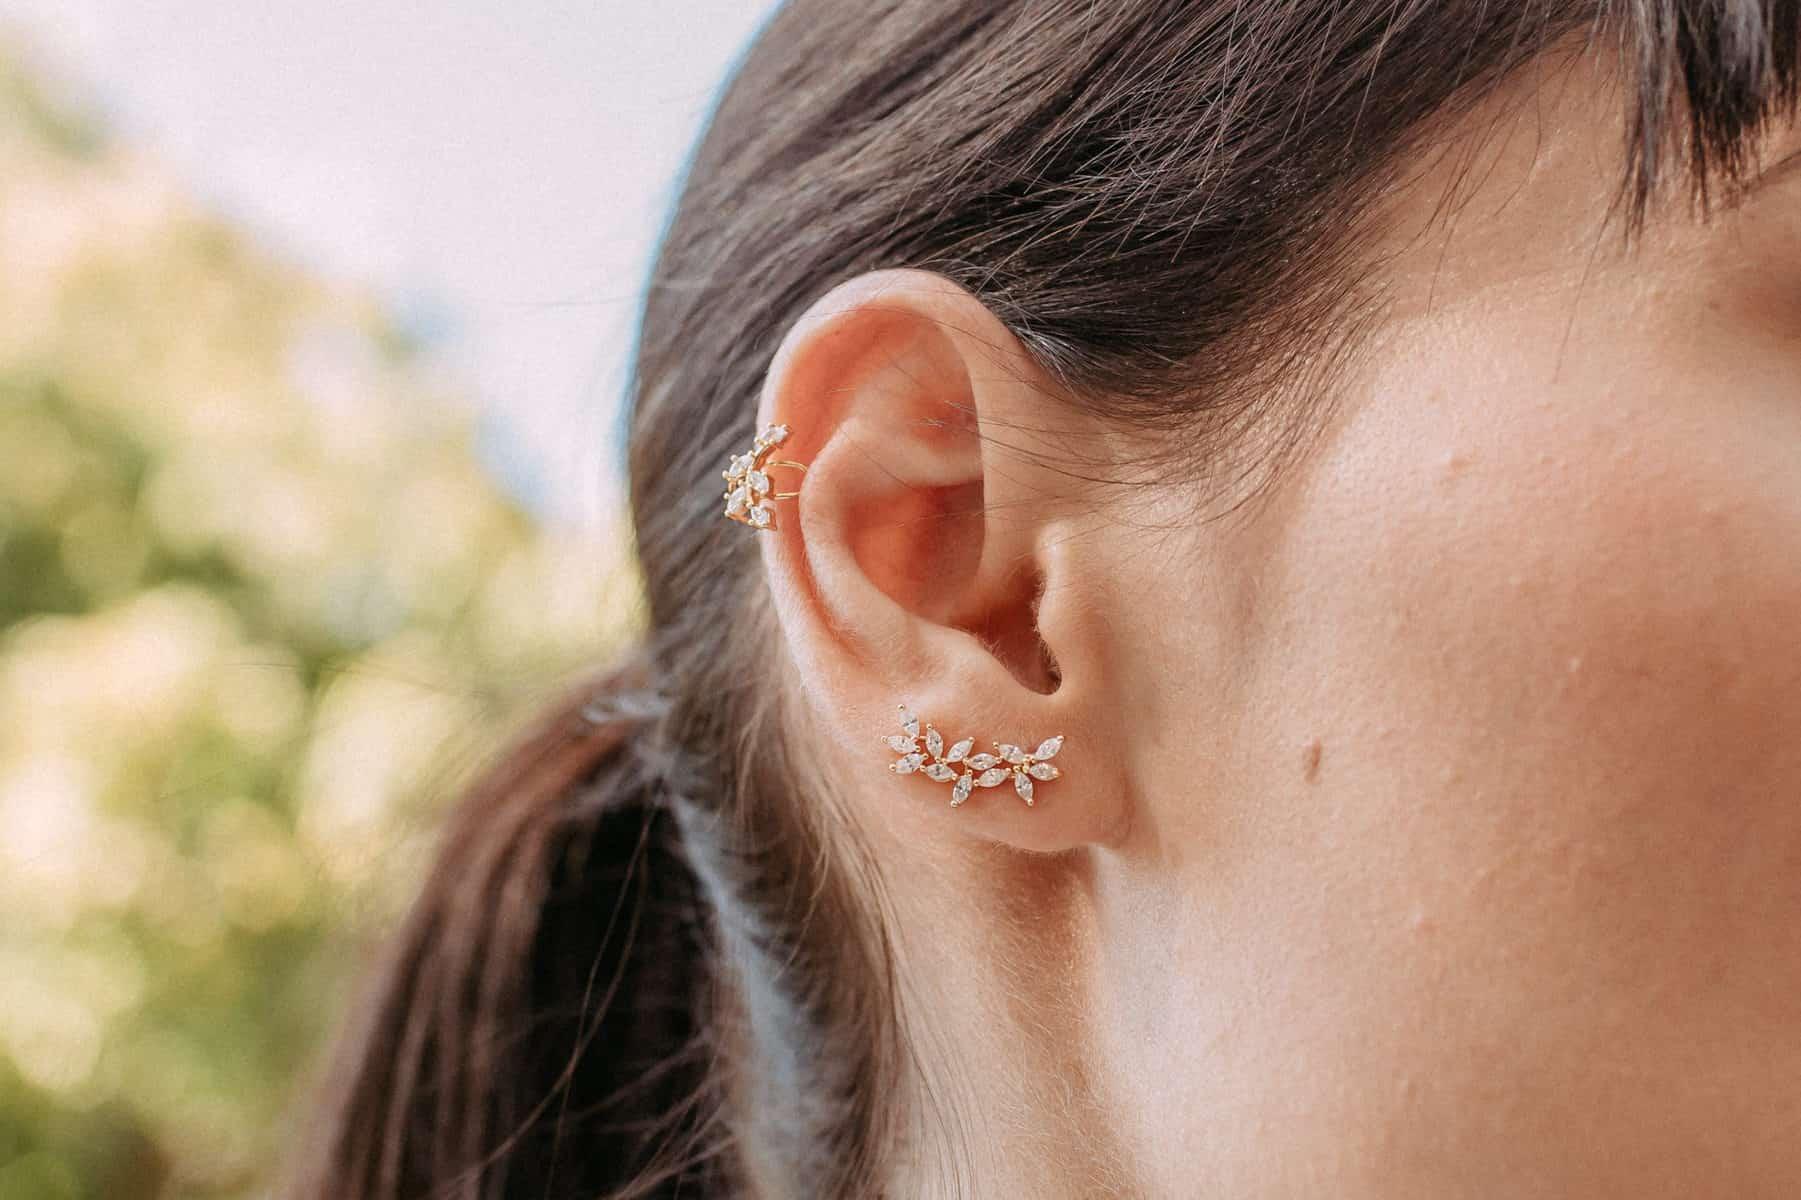 Sentimental-Gifts-for-Girlfriend-Ear-Crawler